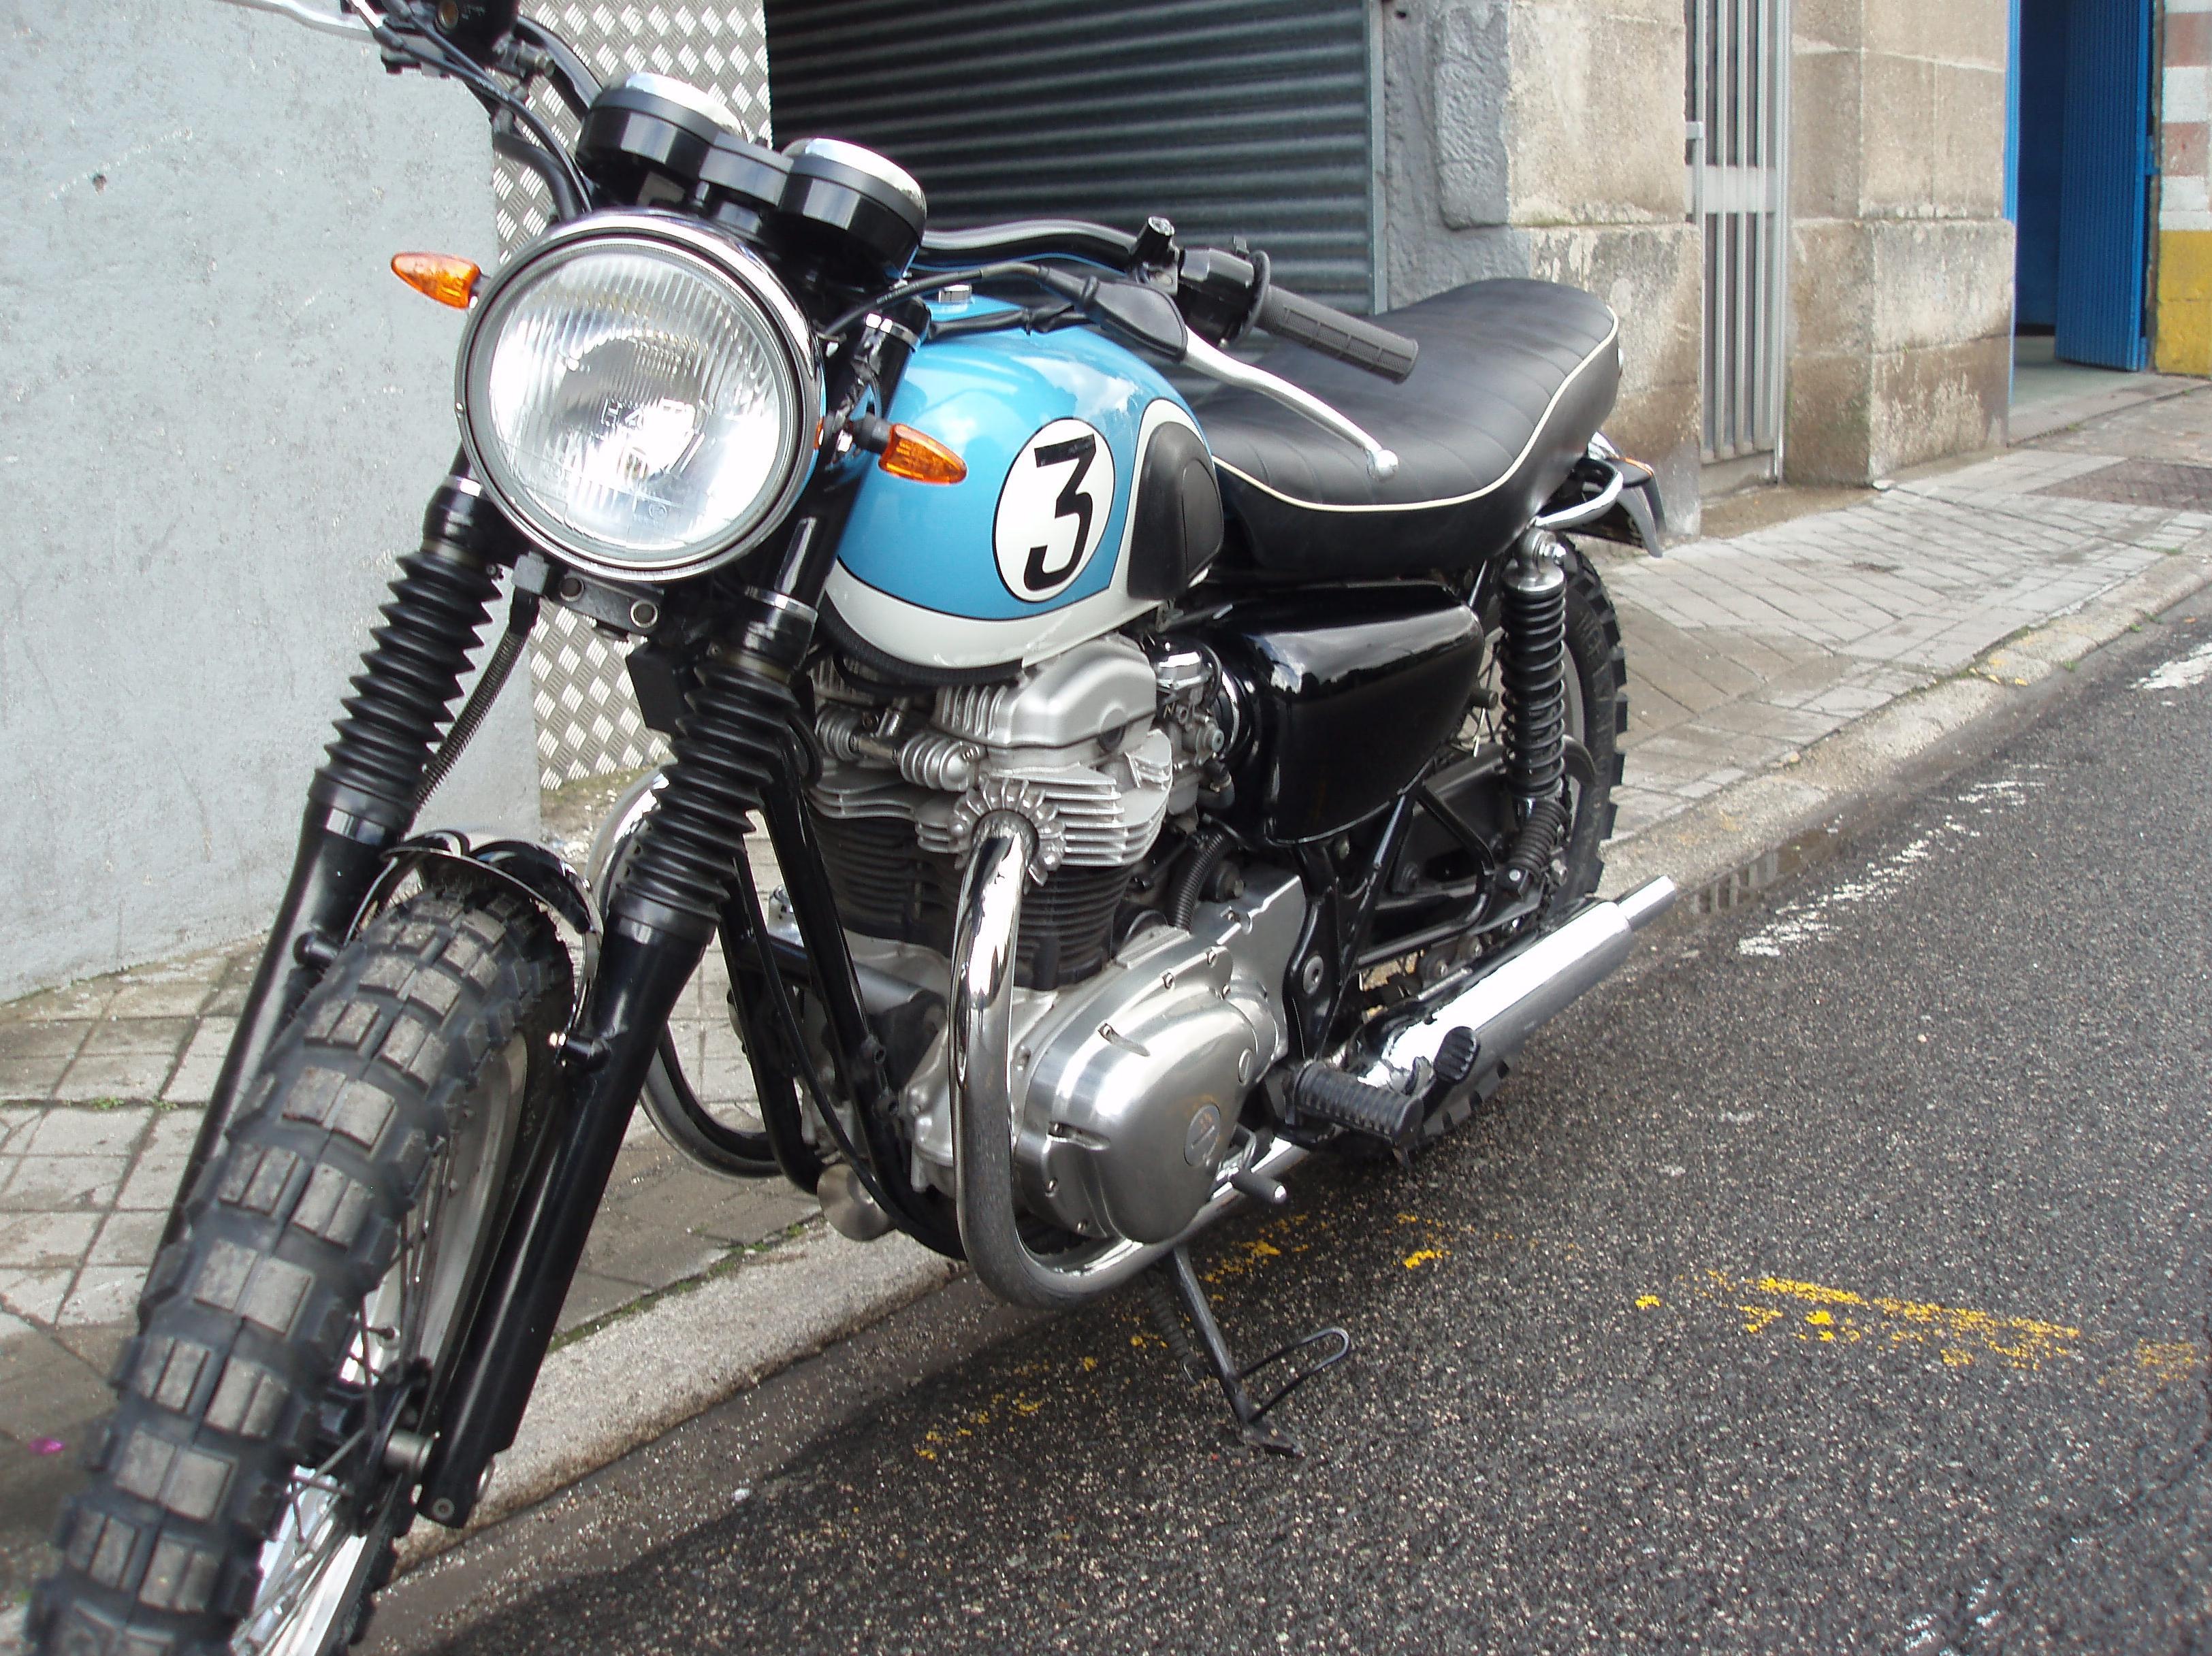 Foto 26 de Motos en Vigo | Moto 2